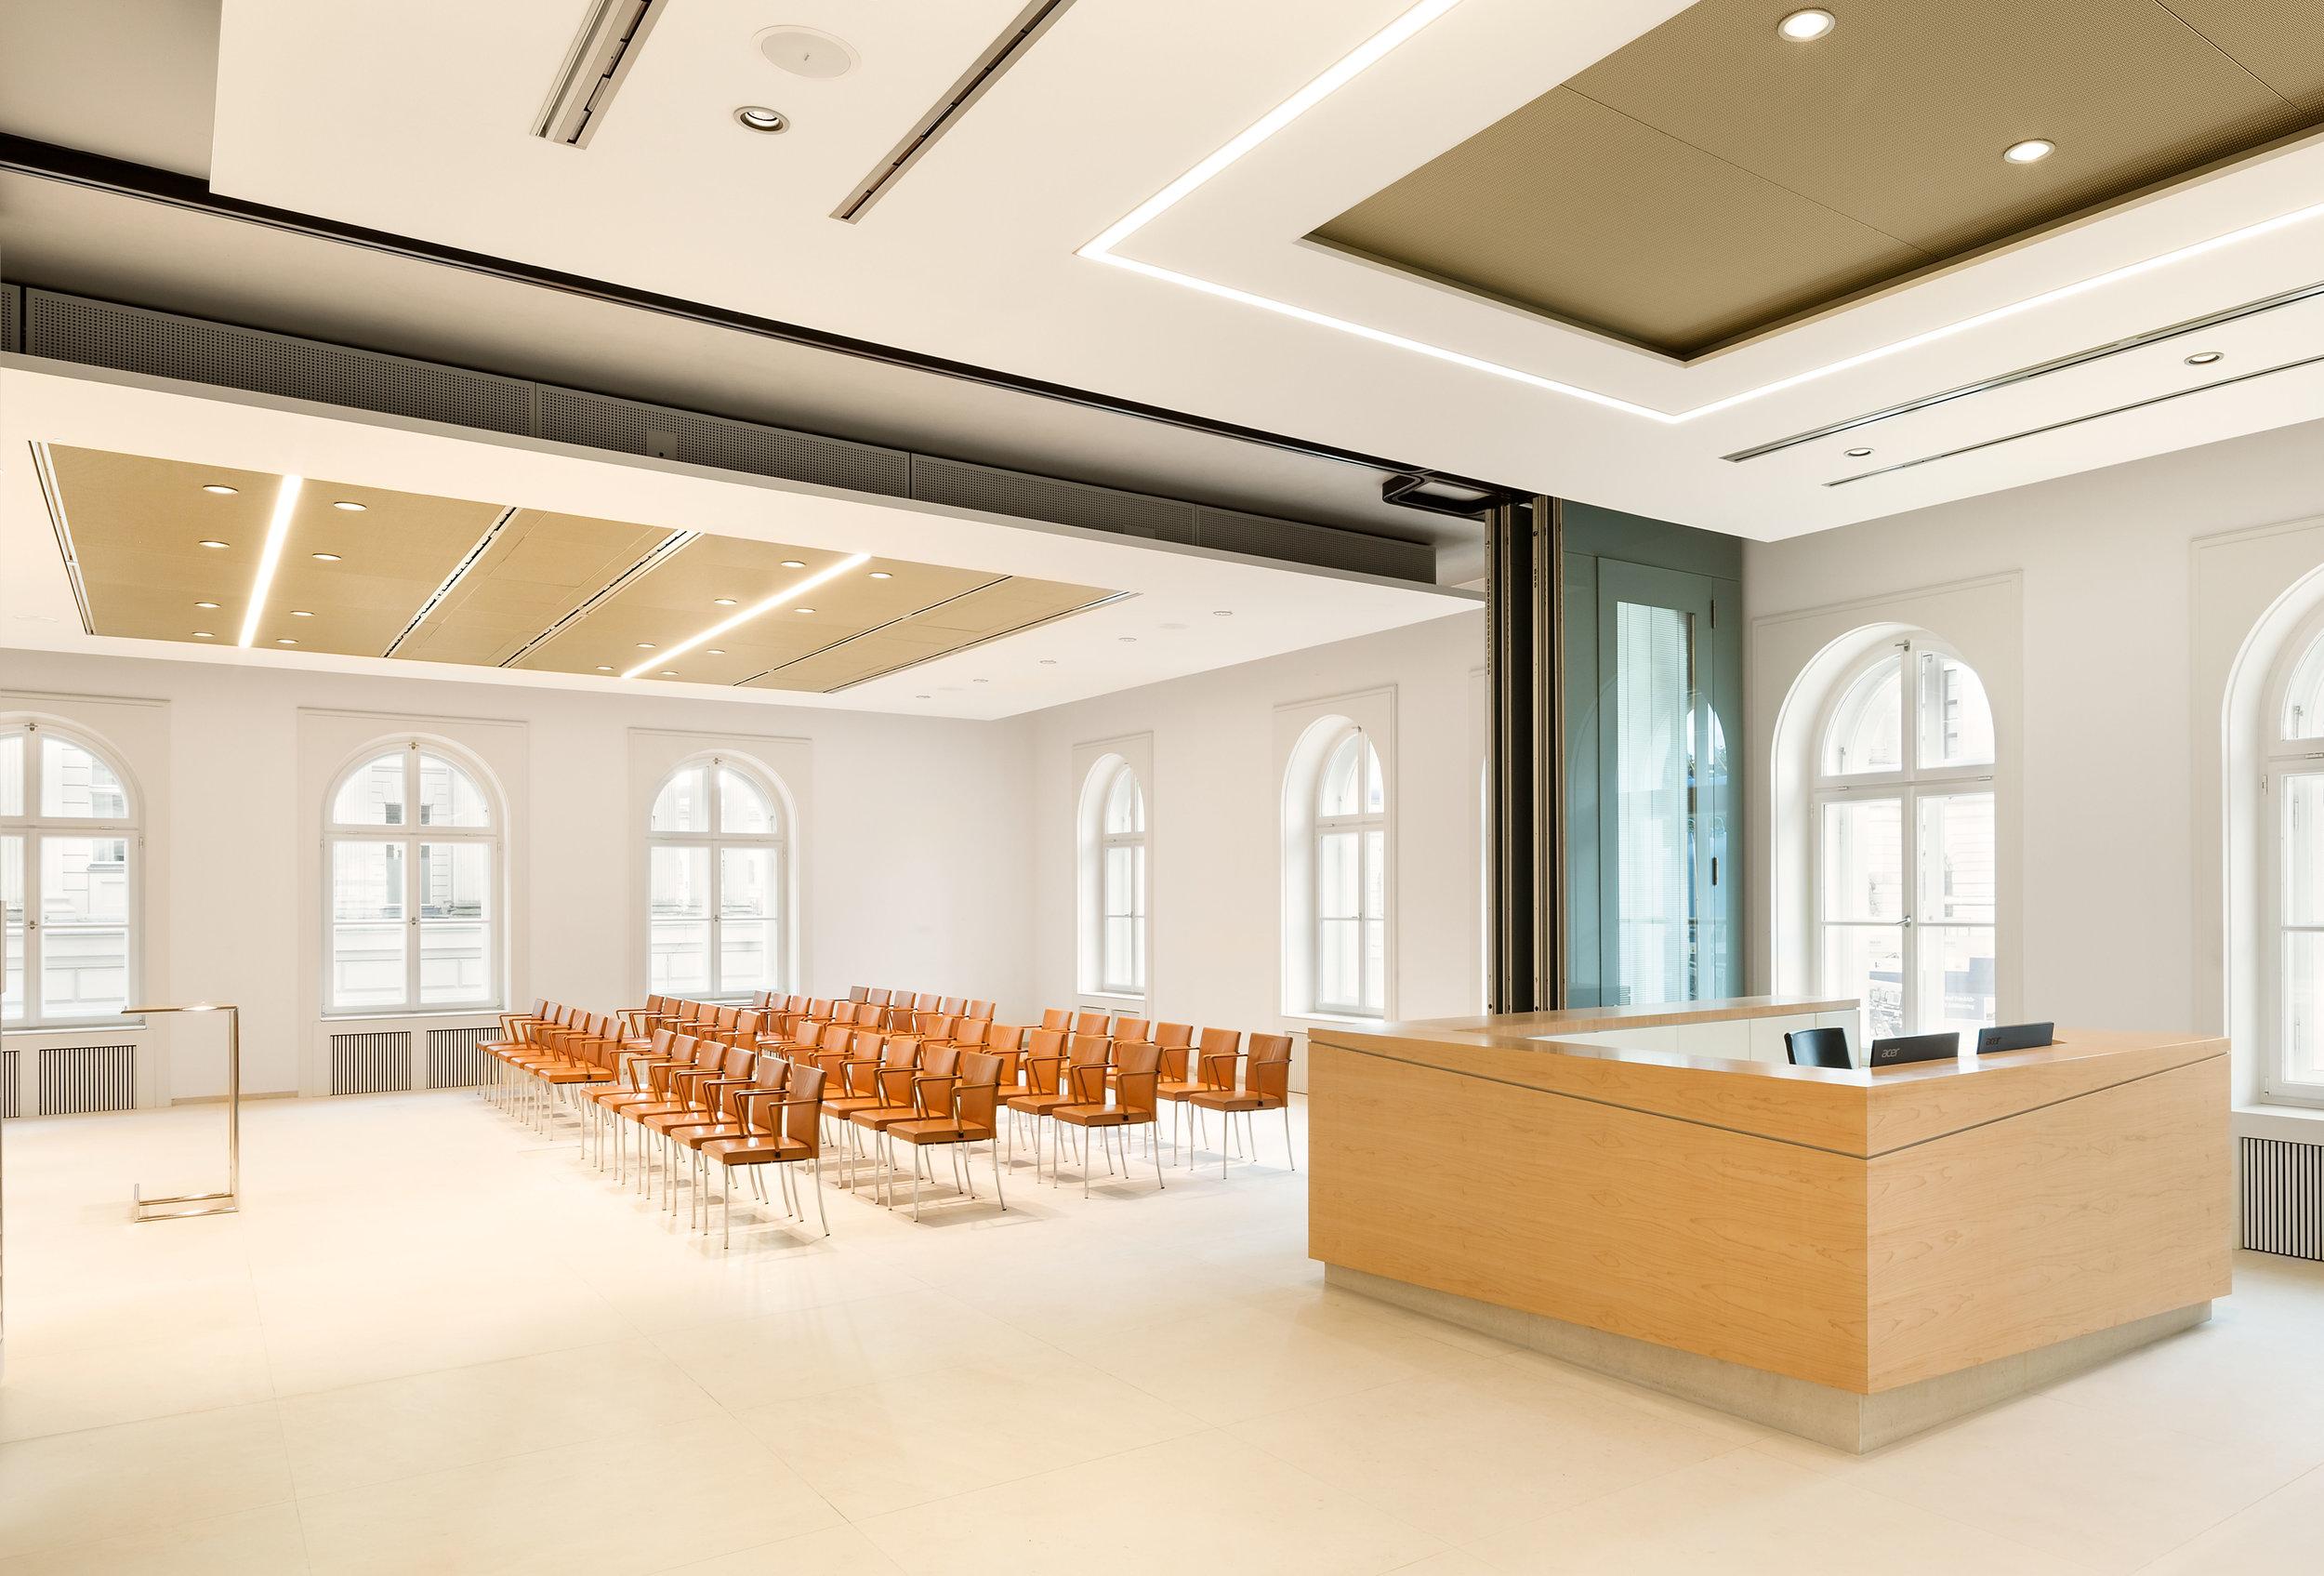 bertelsmann-berlin_coorporate-interior-design_coordination-berlin_04.jpg